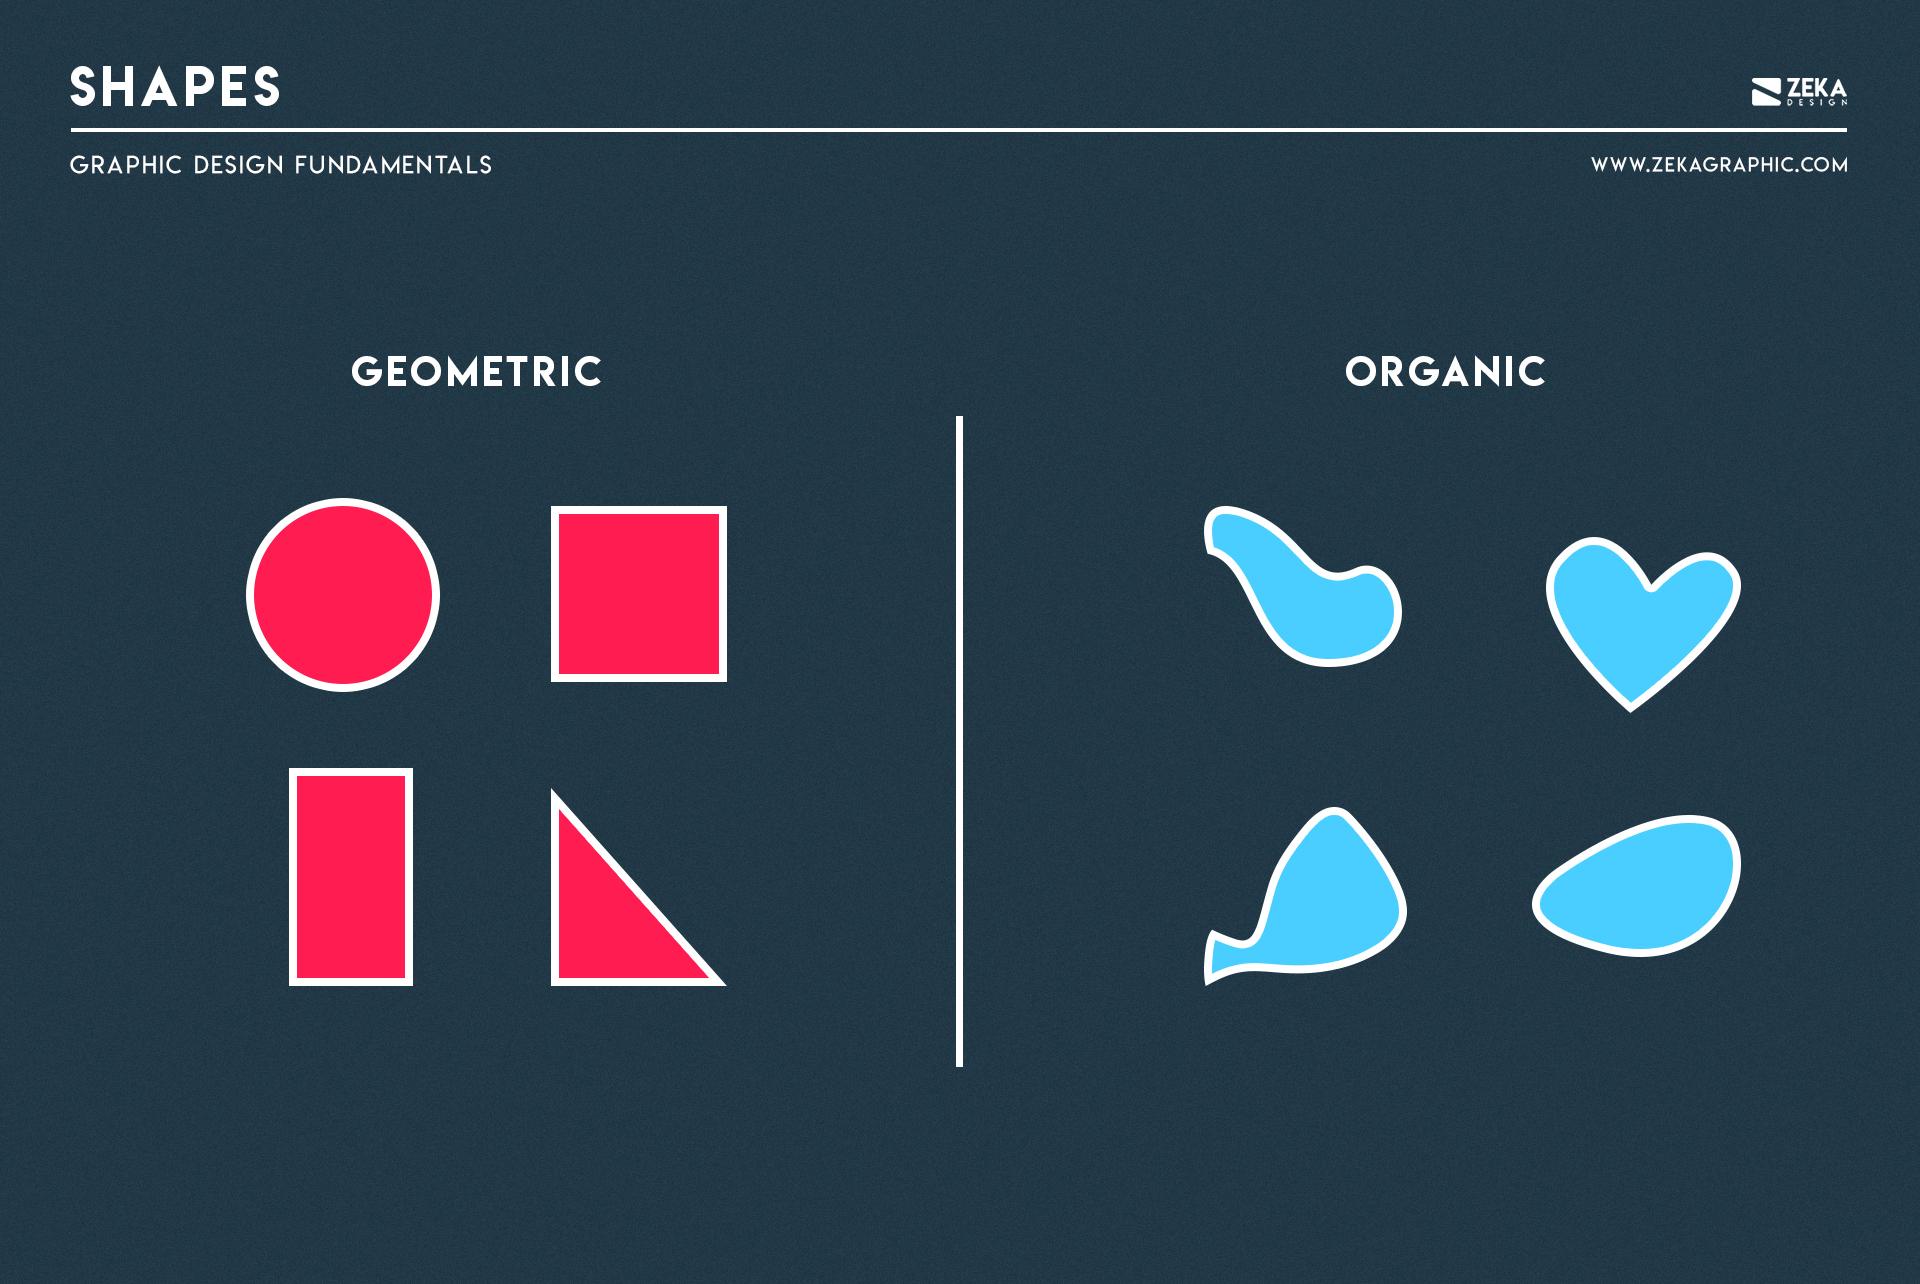 Shapes Graphic Design Fundamental Elements